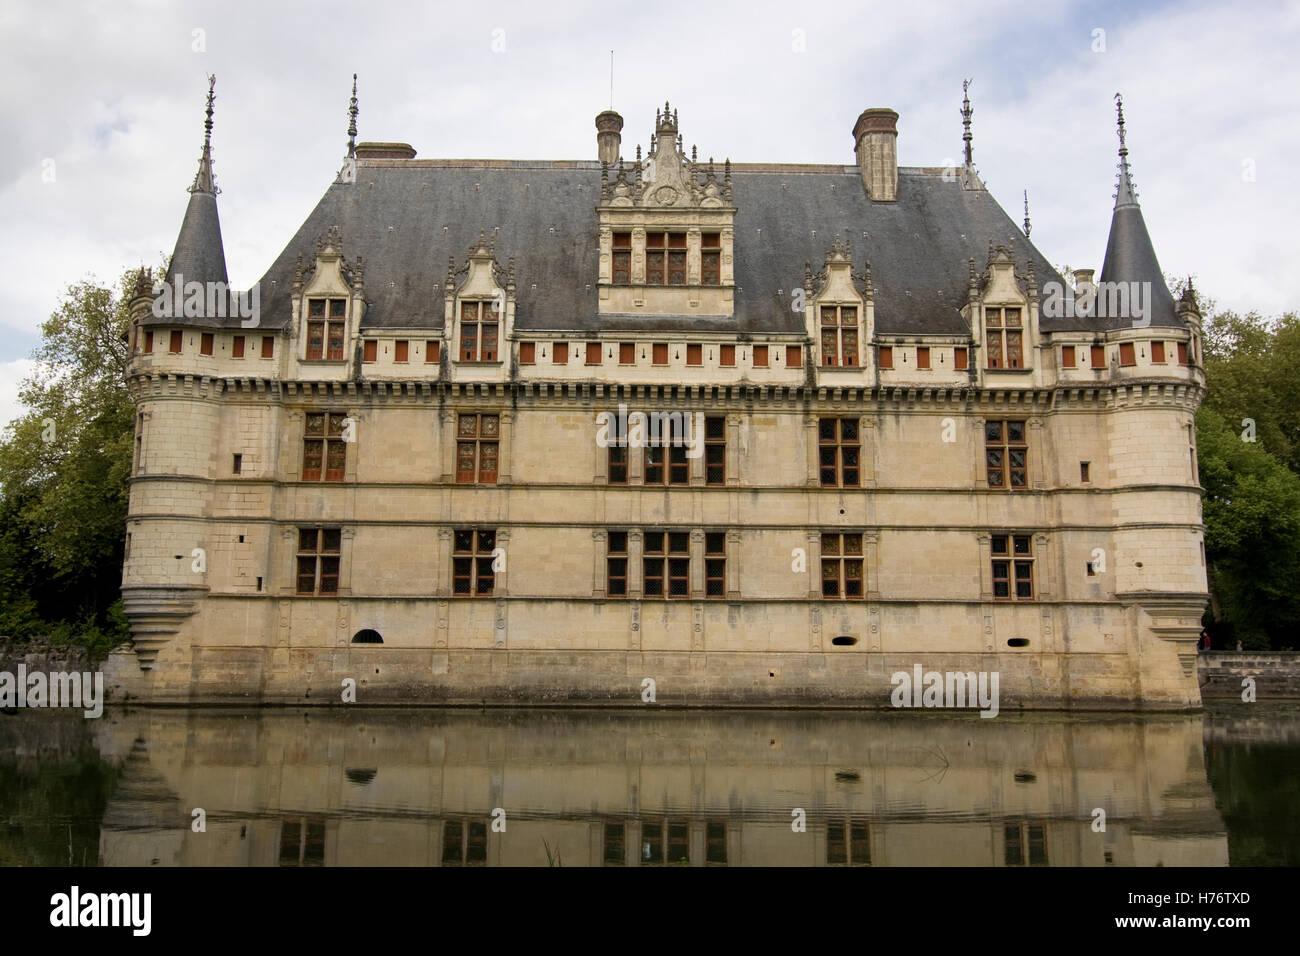 Azay-le-Rideau: Westfassade Frontal; Schloss Azay-le-Rideau, West ...